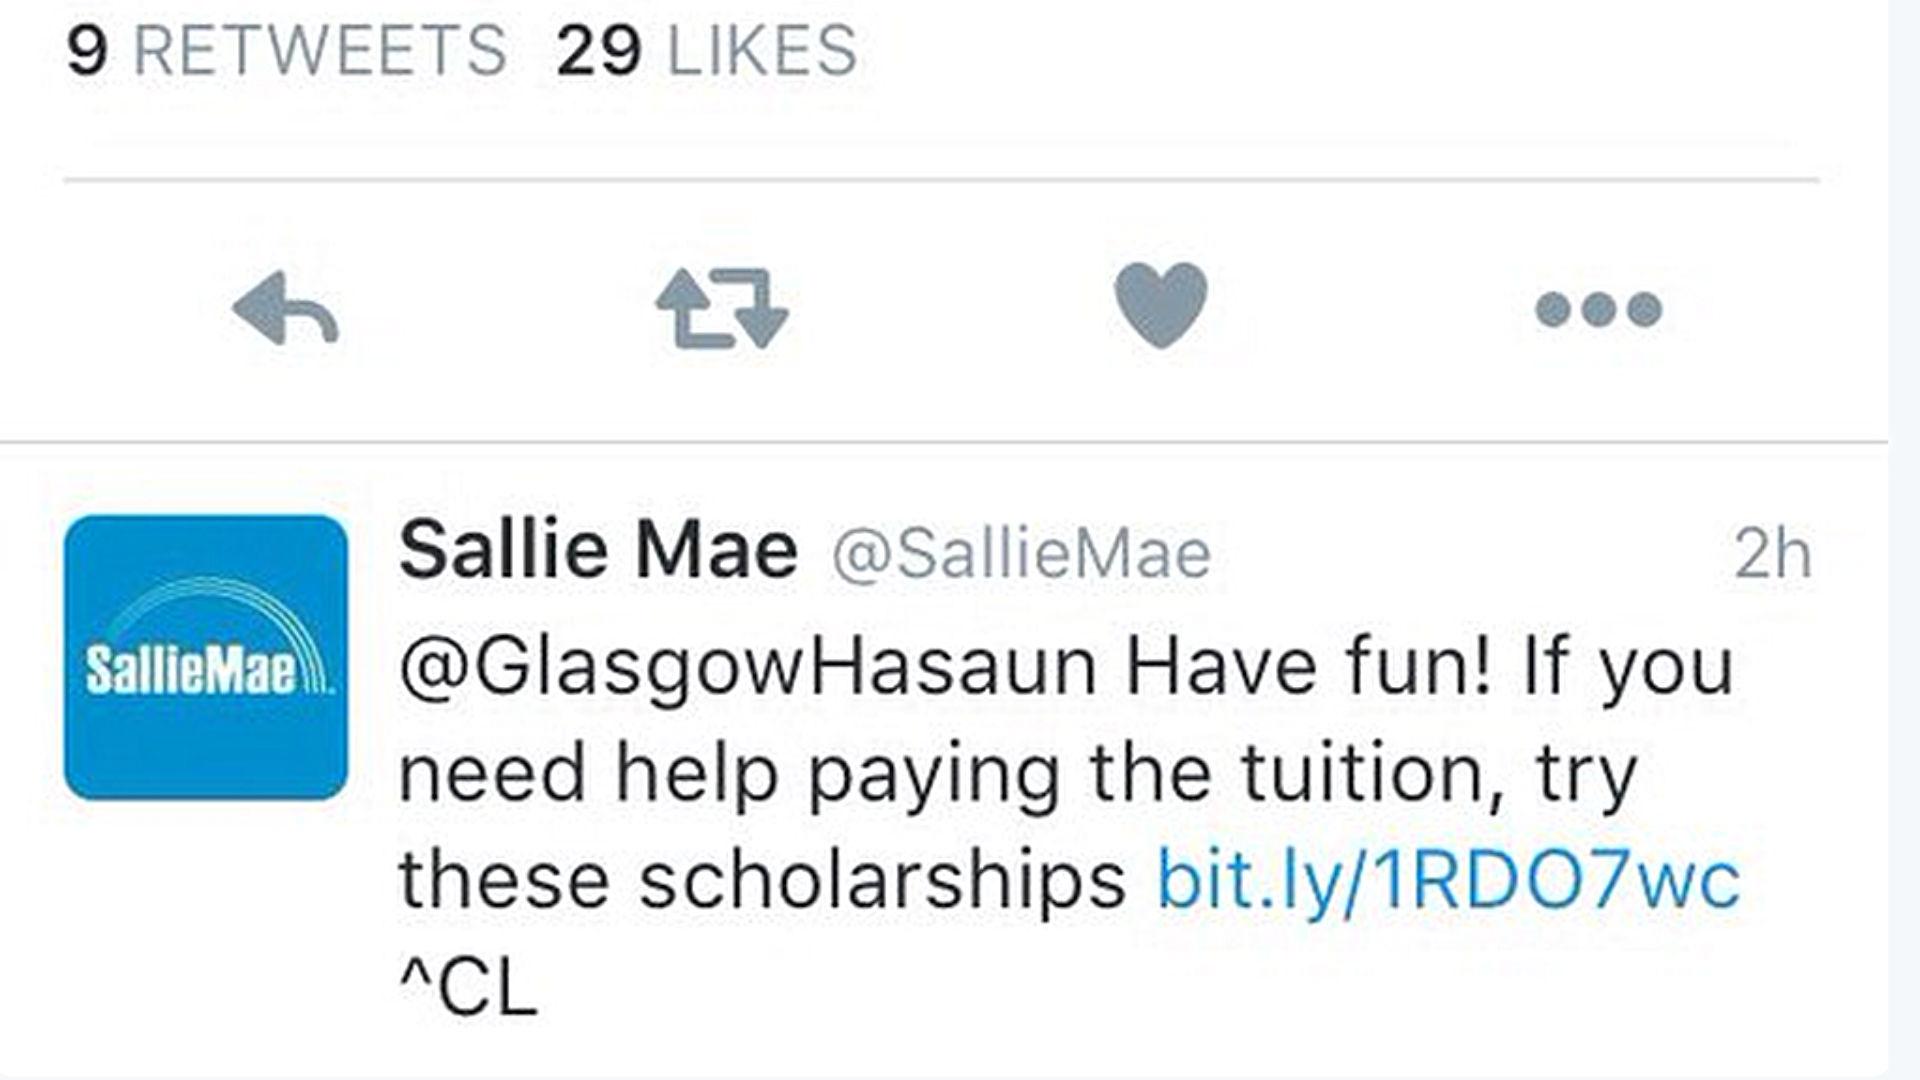 sallie-mae-12216-usnews-twitter-ftr